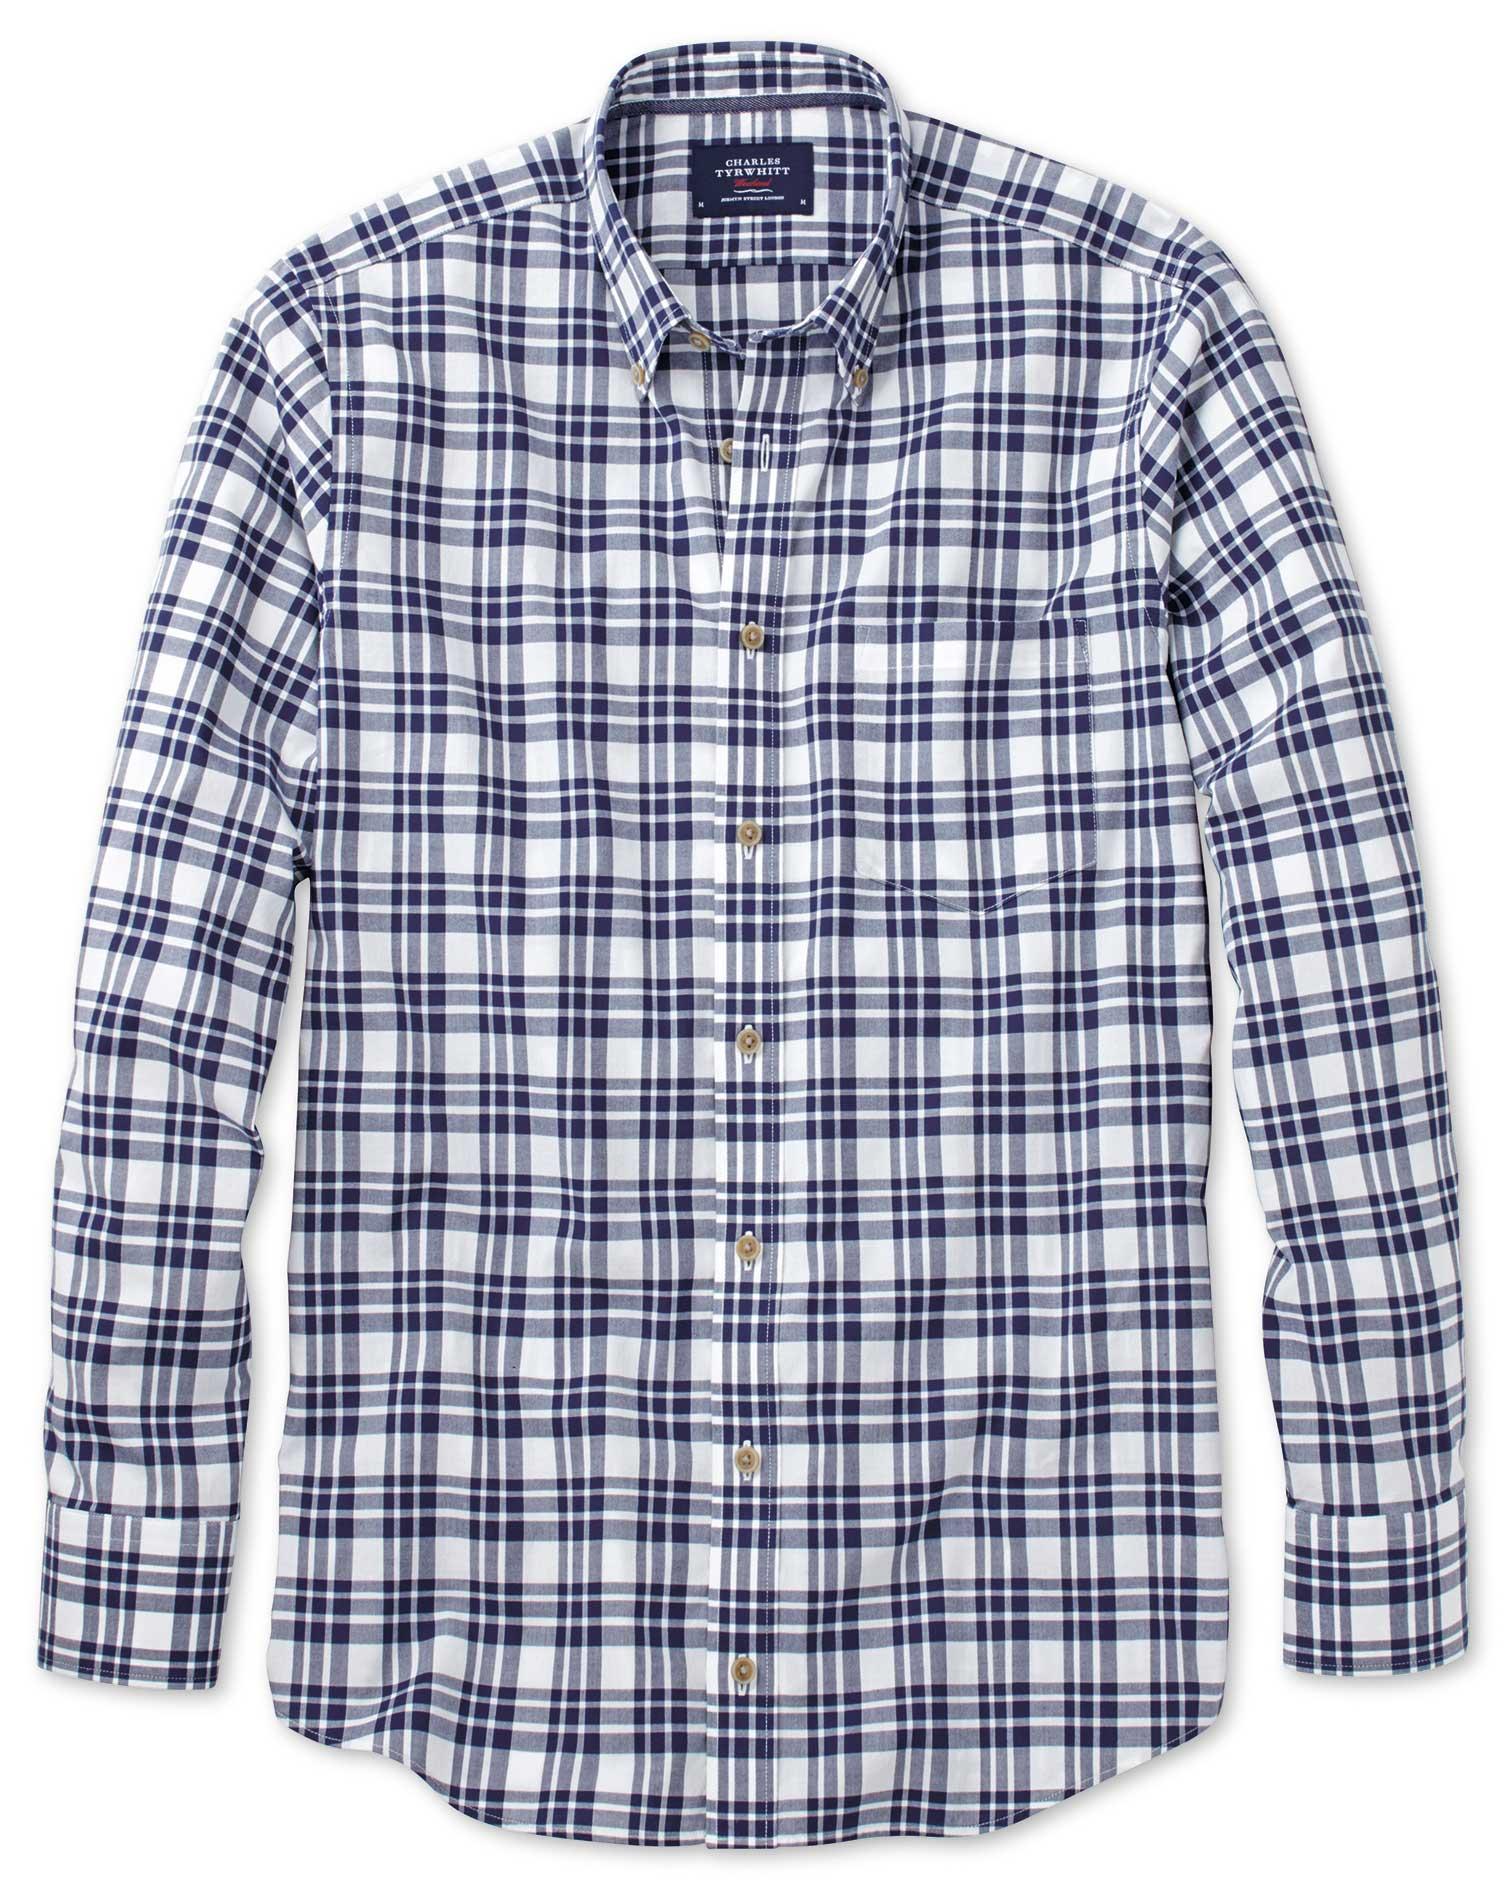 Slim Fit Button-Down Poplin Navy Blue Check Cotton Shirt Single Cuff Size Medium by Charles Tyrwhitt